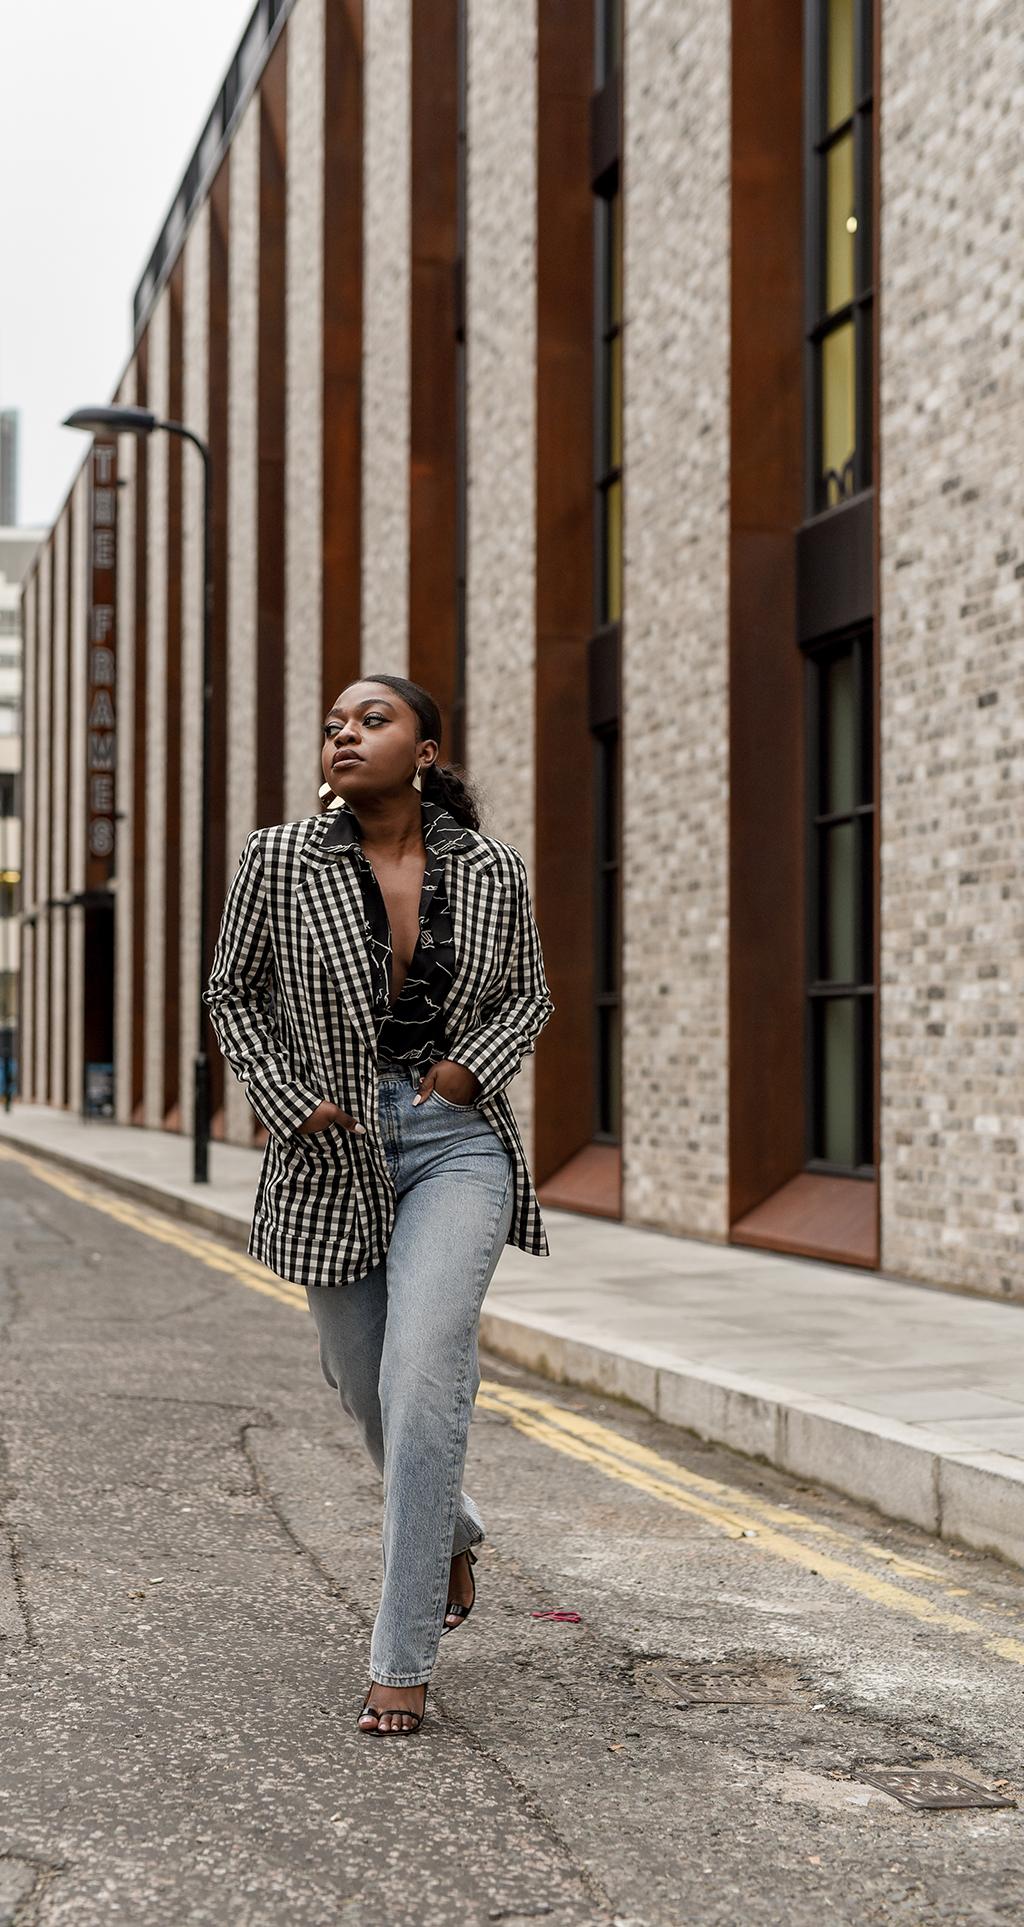 Mirror Me | London Fashion, Travel & Personal Development